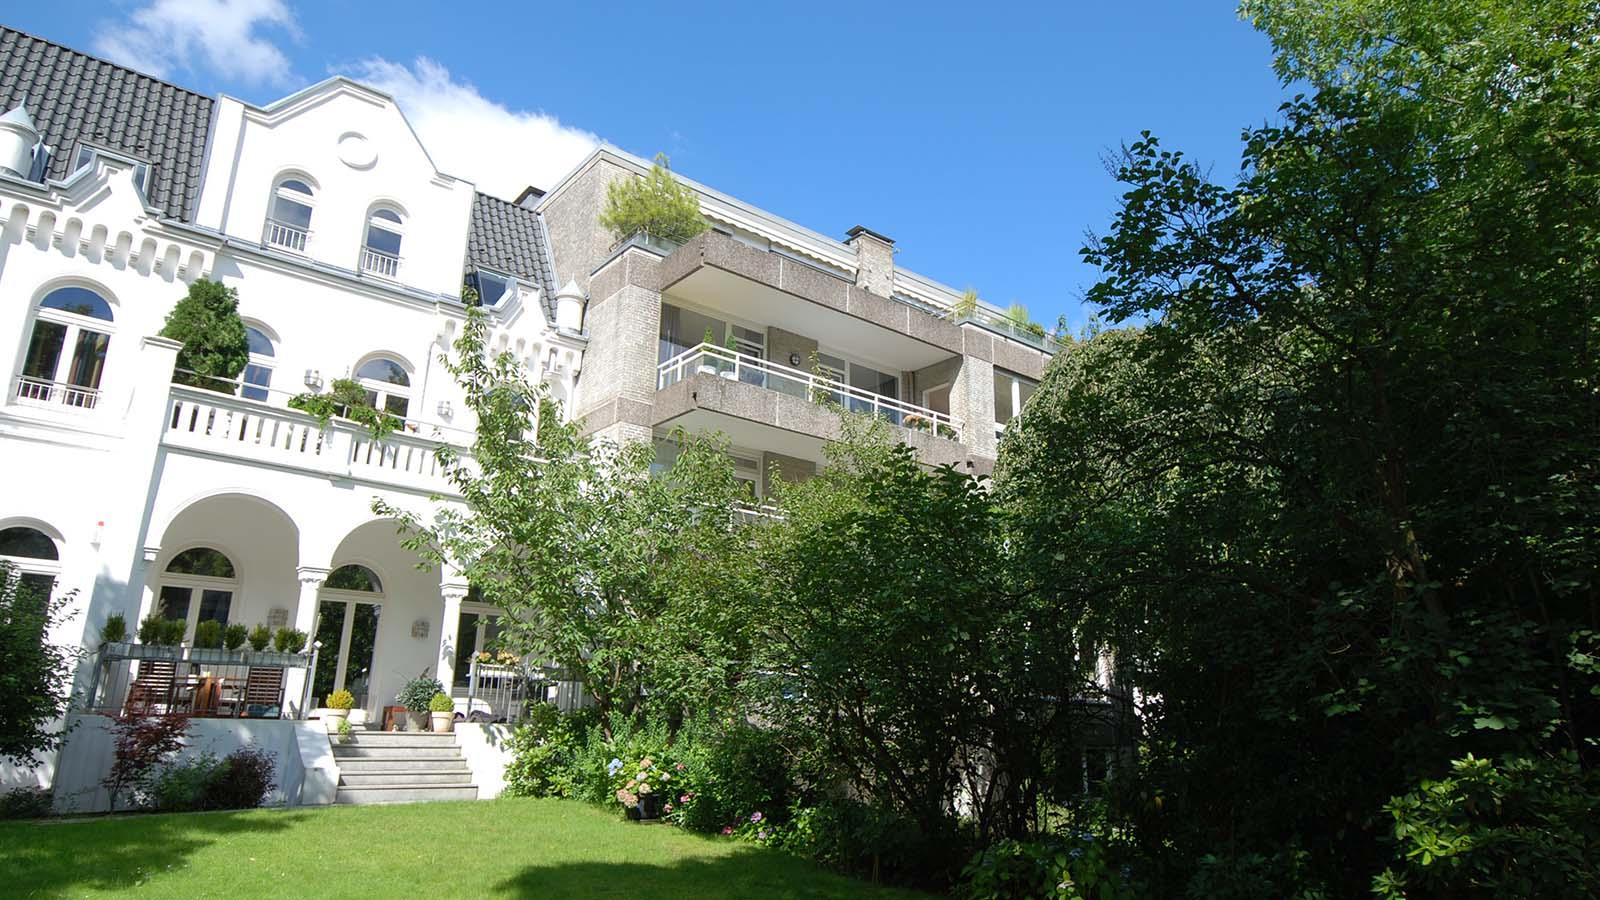 hamburg uhlenhorst penthouse mit wundersch ner terrasse streifzug media gmbh. Black Bedroom Furniture Sets. Home Design Ideas